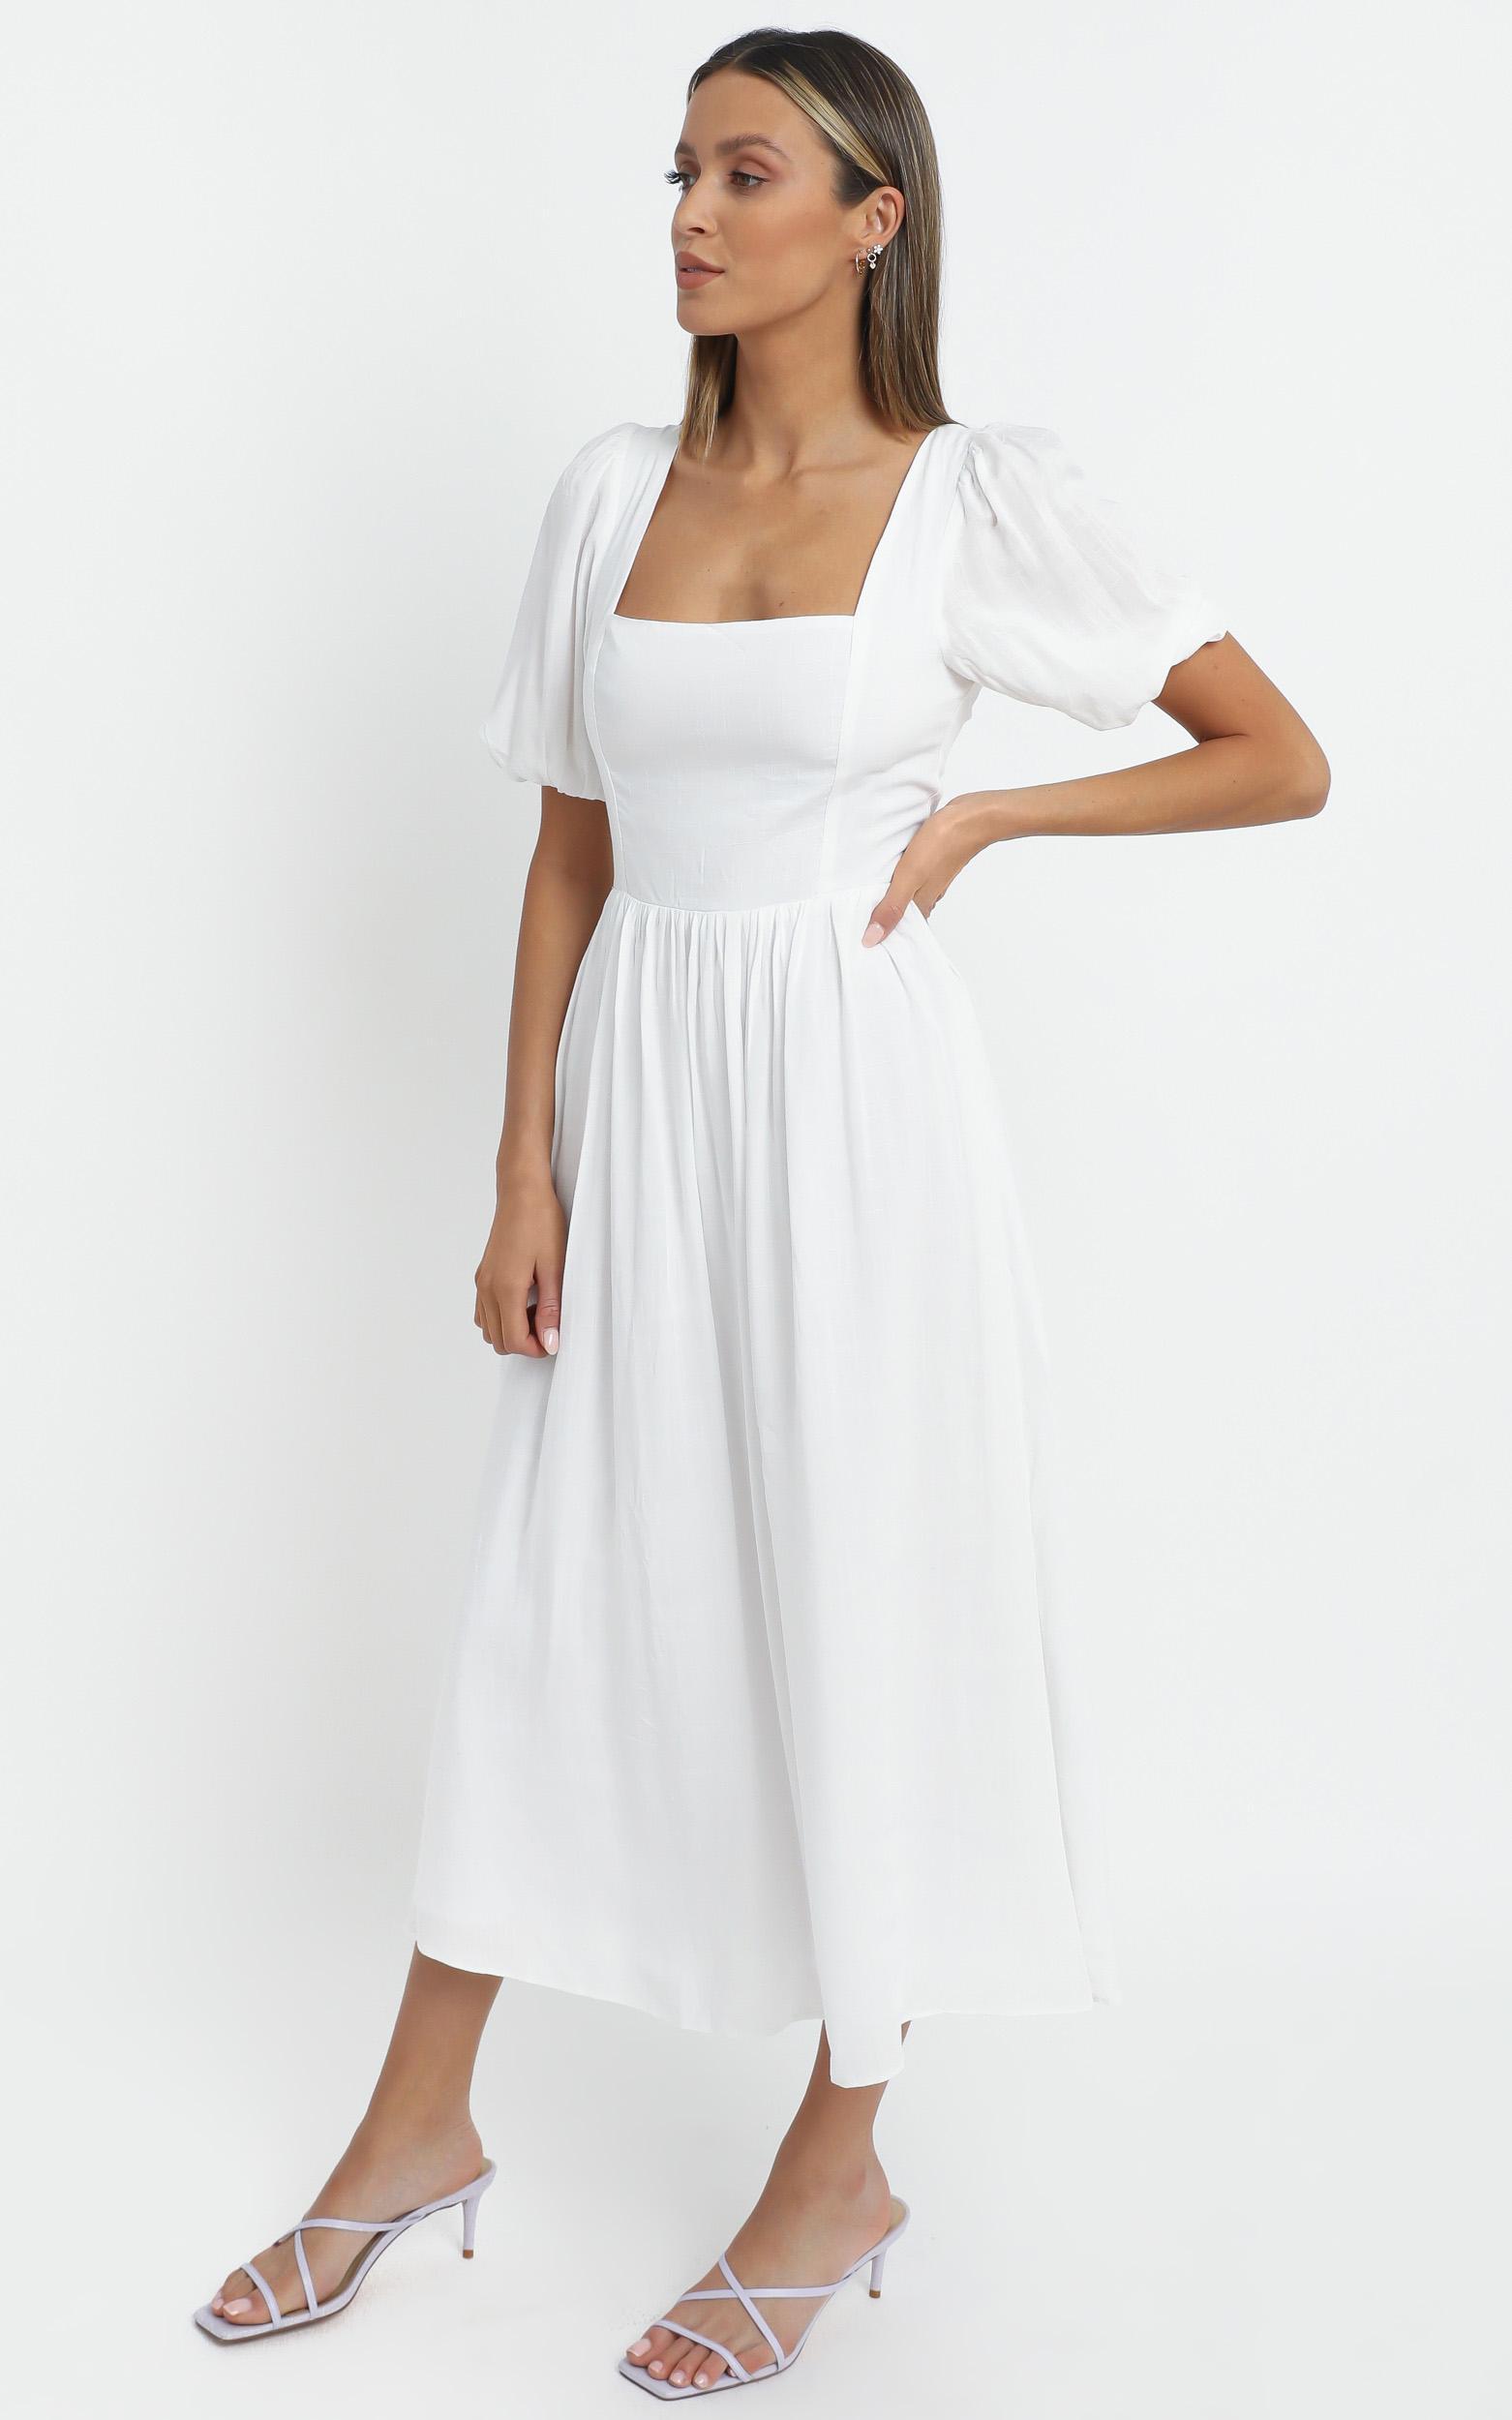 Poppy Dress in White - 14 (XL), White, hi-res image number null